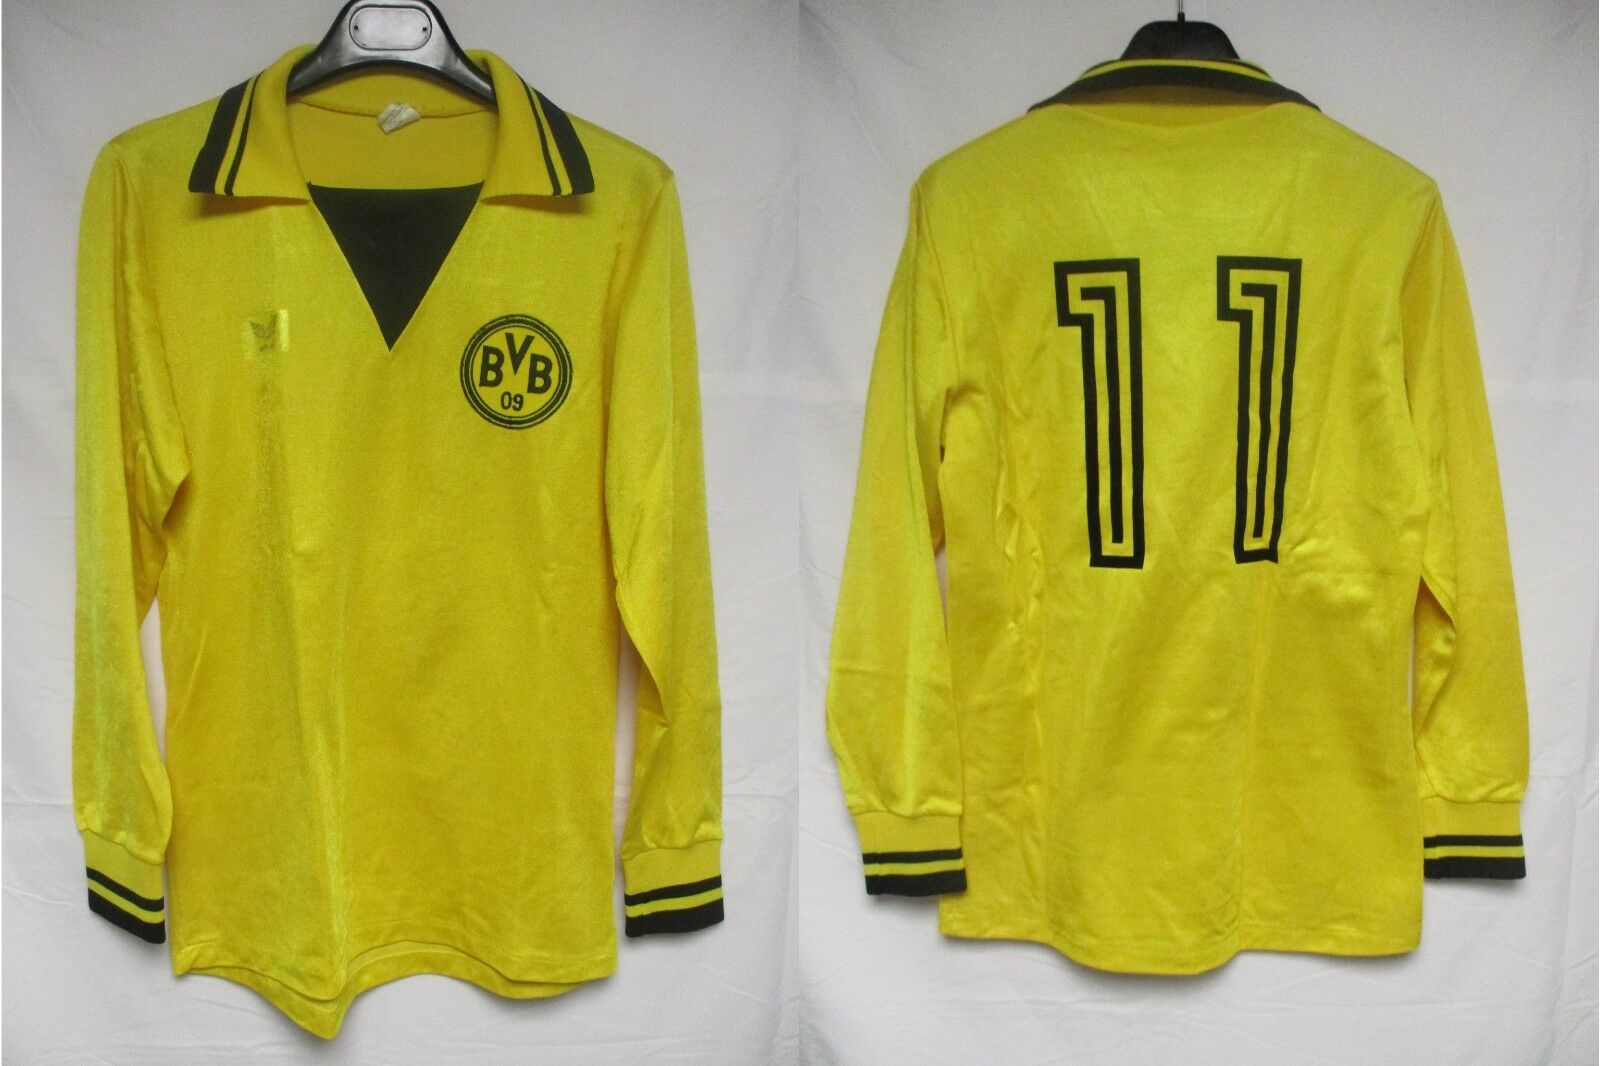 Maillot BVB BORUSSIA DORTMUND Erima n°11 trikot oldschool shirt 1980 LS rare M